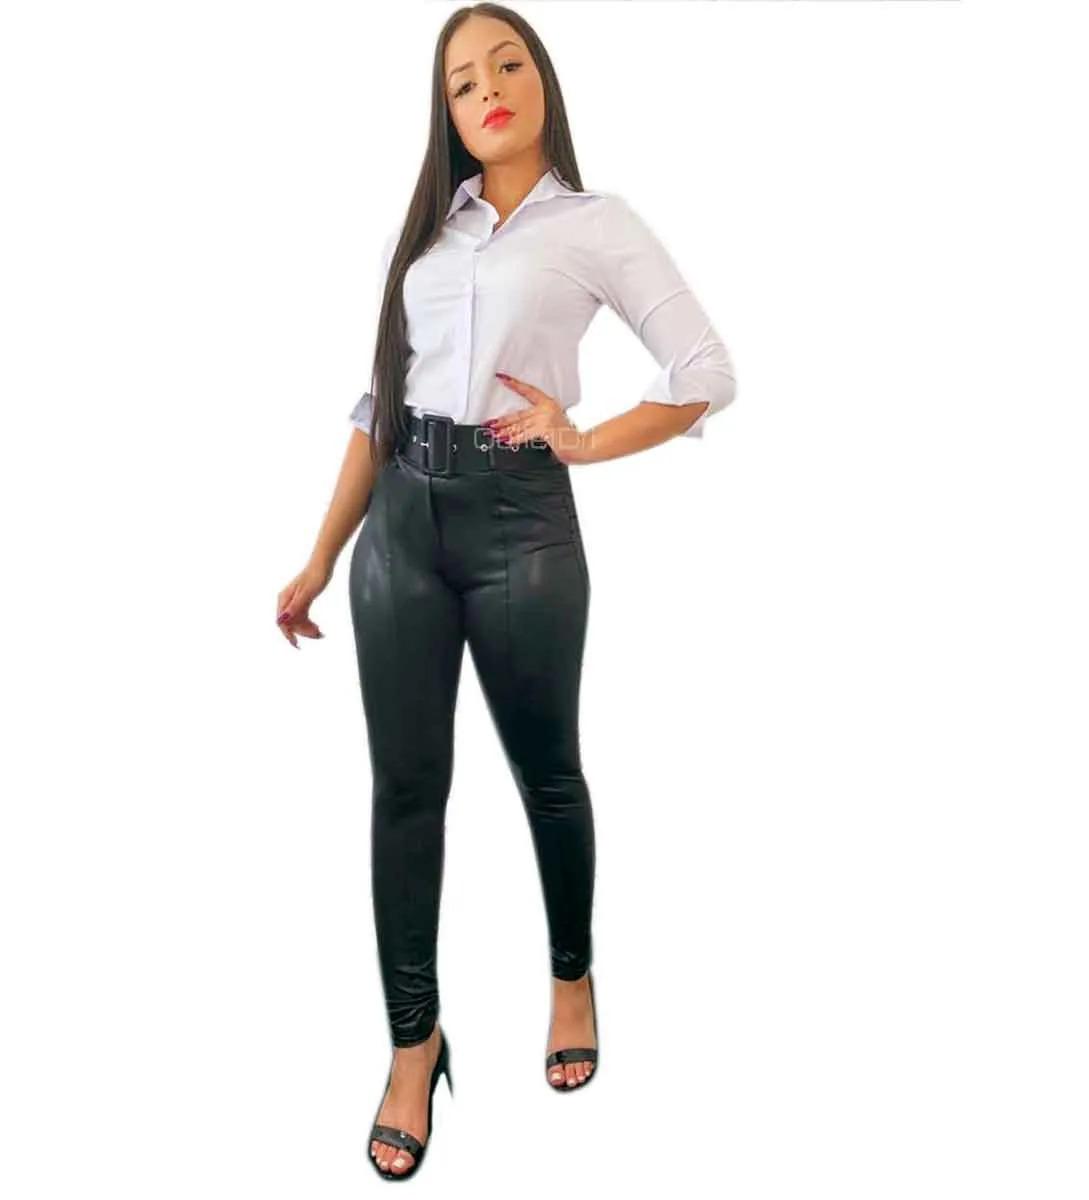 Camisete Plus size Camisa Feminino Social Branco Manga 3/4 Promoção